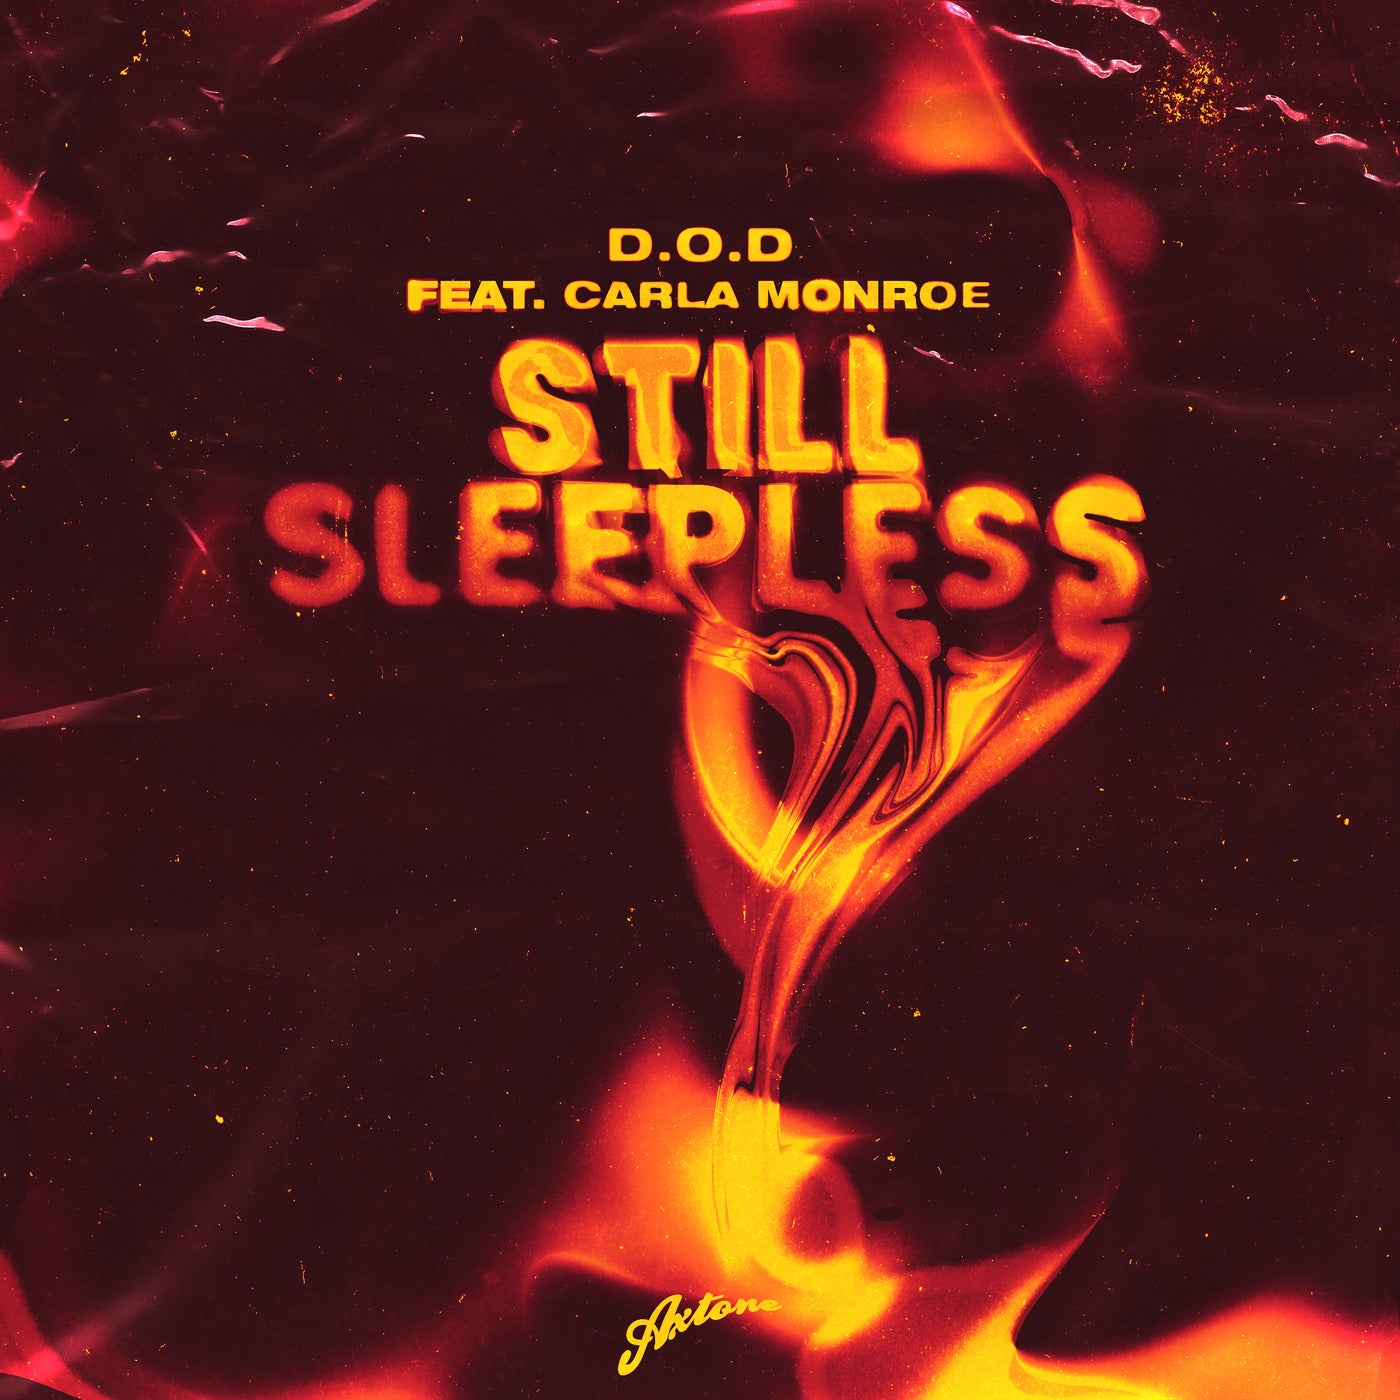 Still Sleepless (Extended Mix)